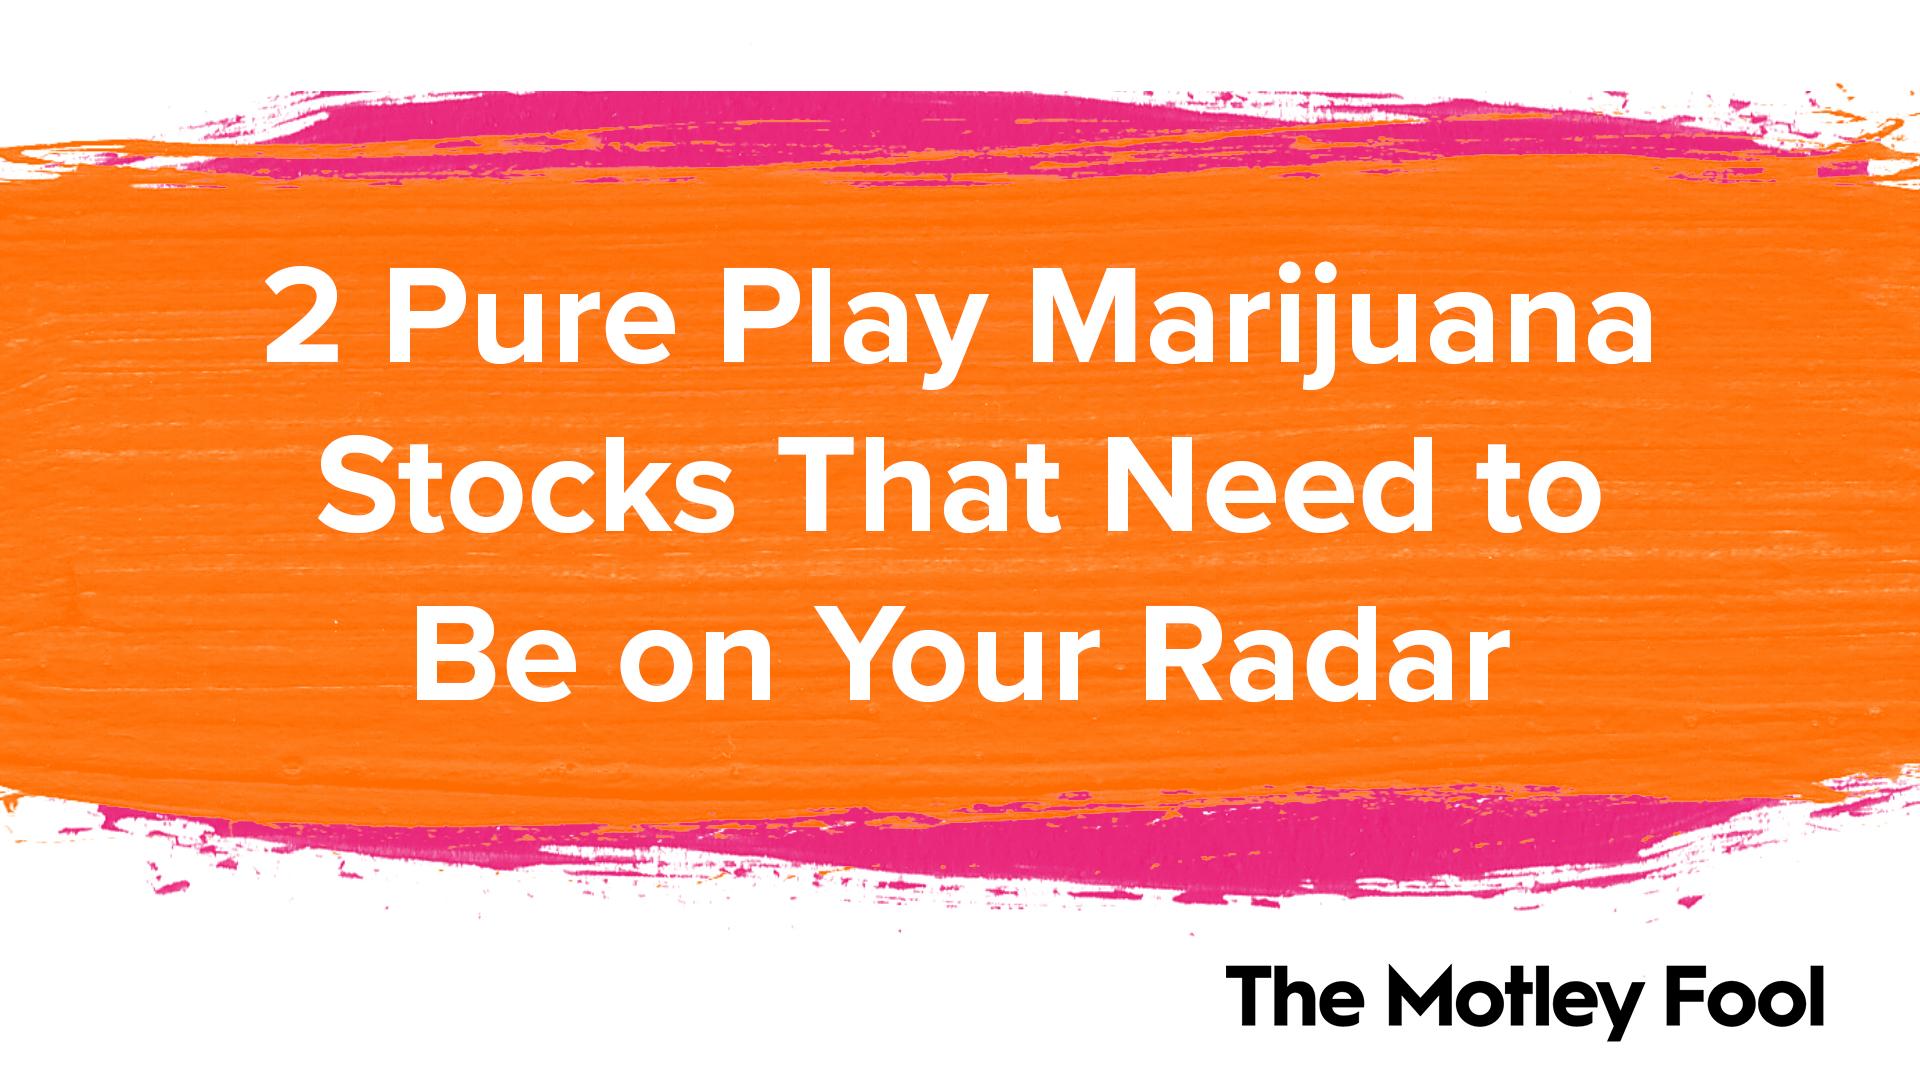 2 Pure Play Marijuana Stocks That Need to Be on Your Radar - The Motley Fool